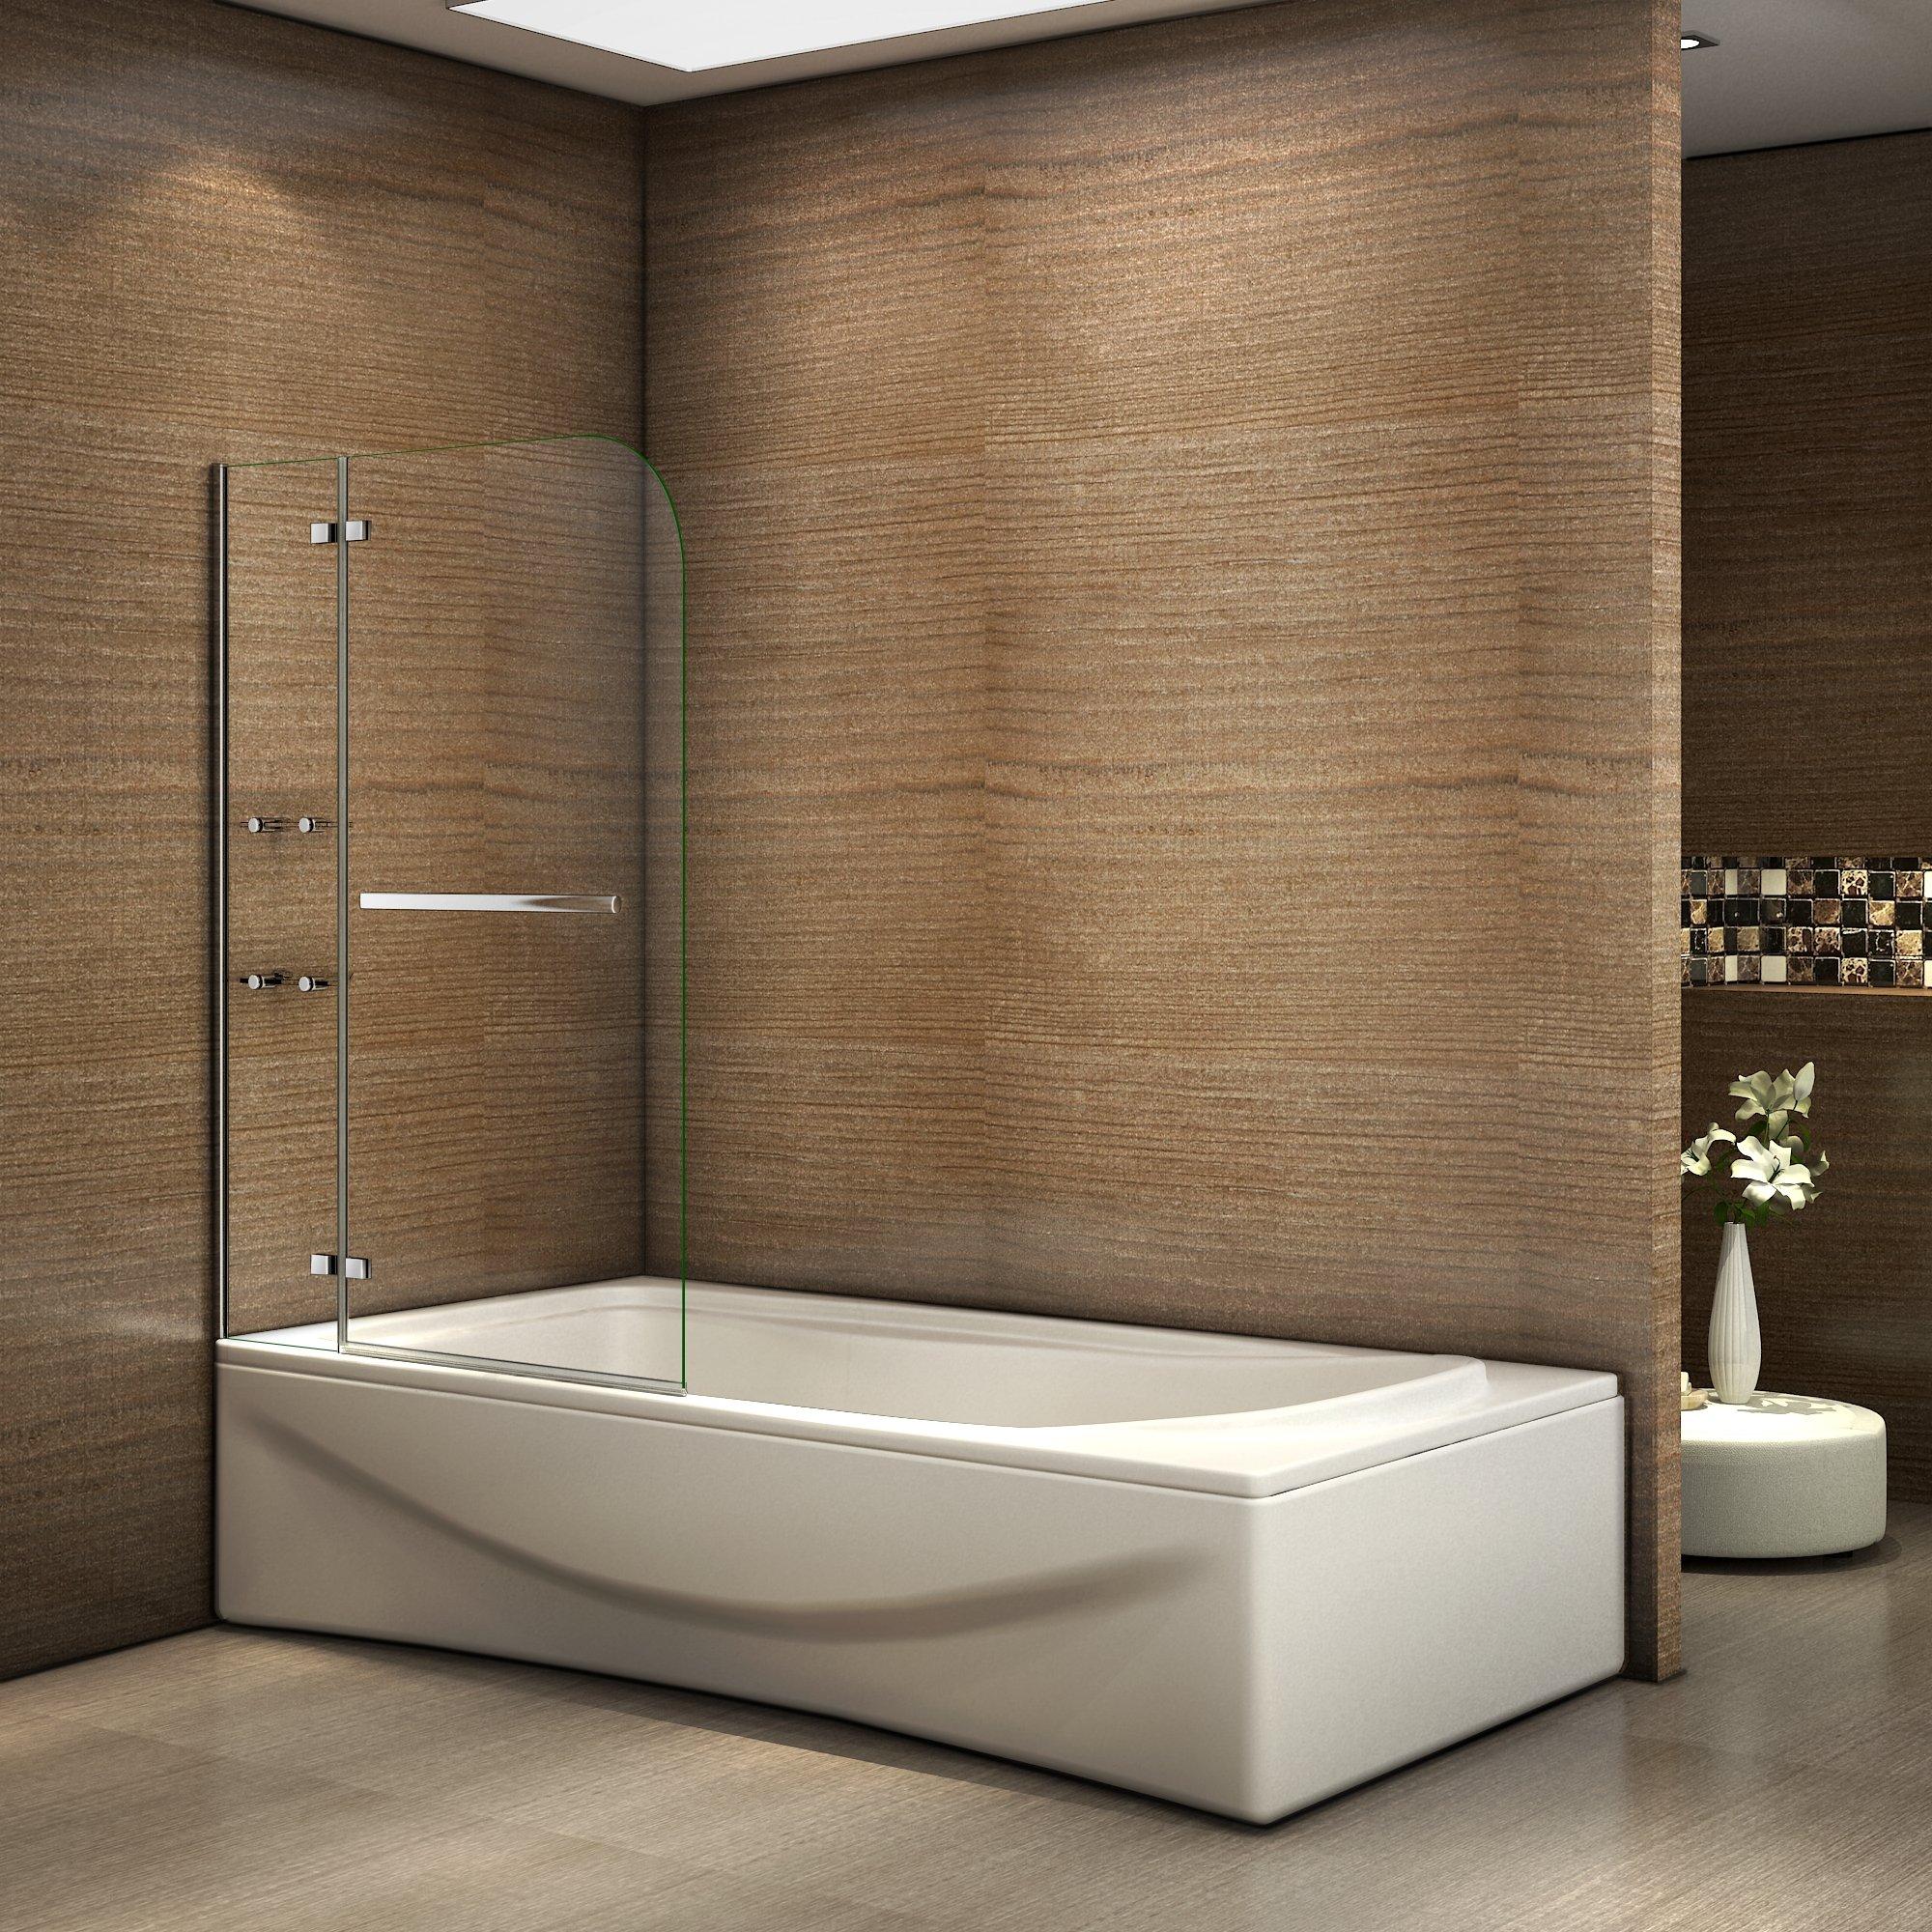 La vasca da bagno